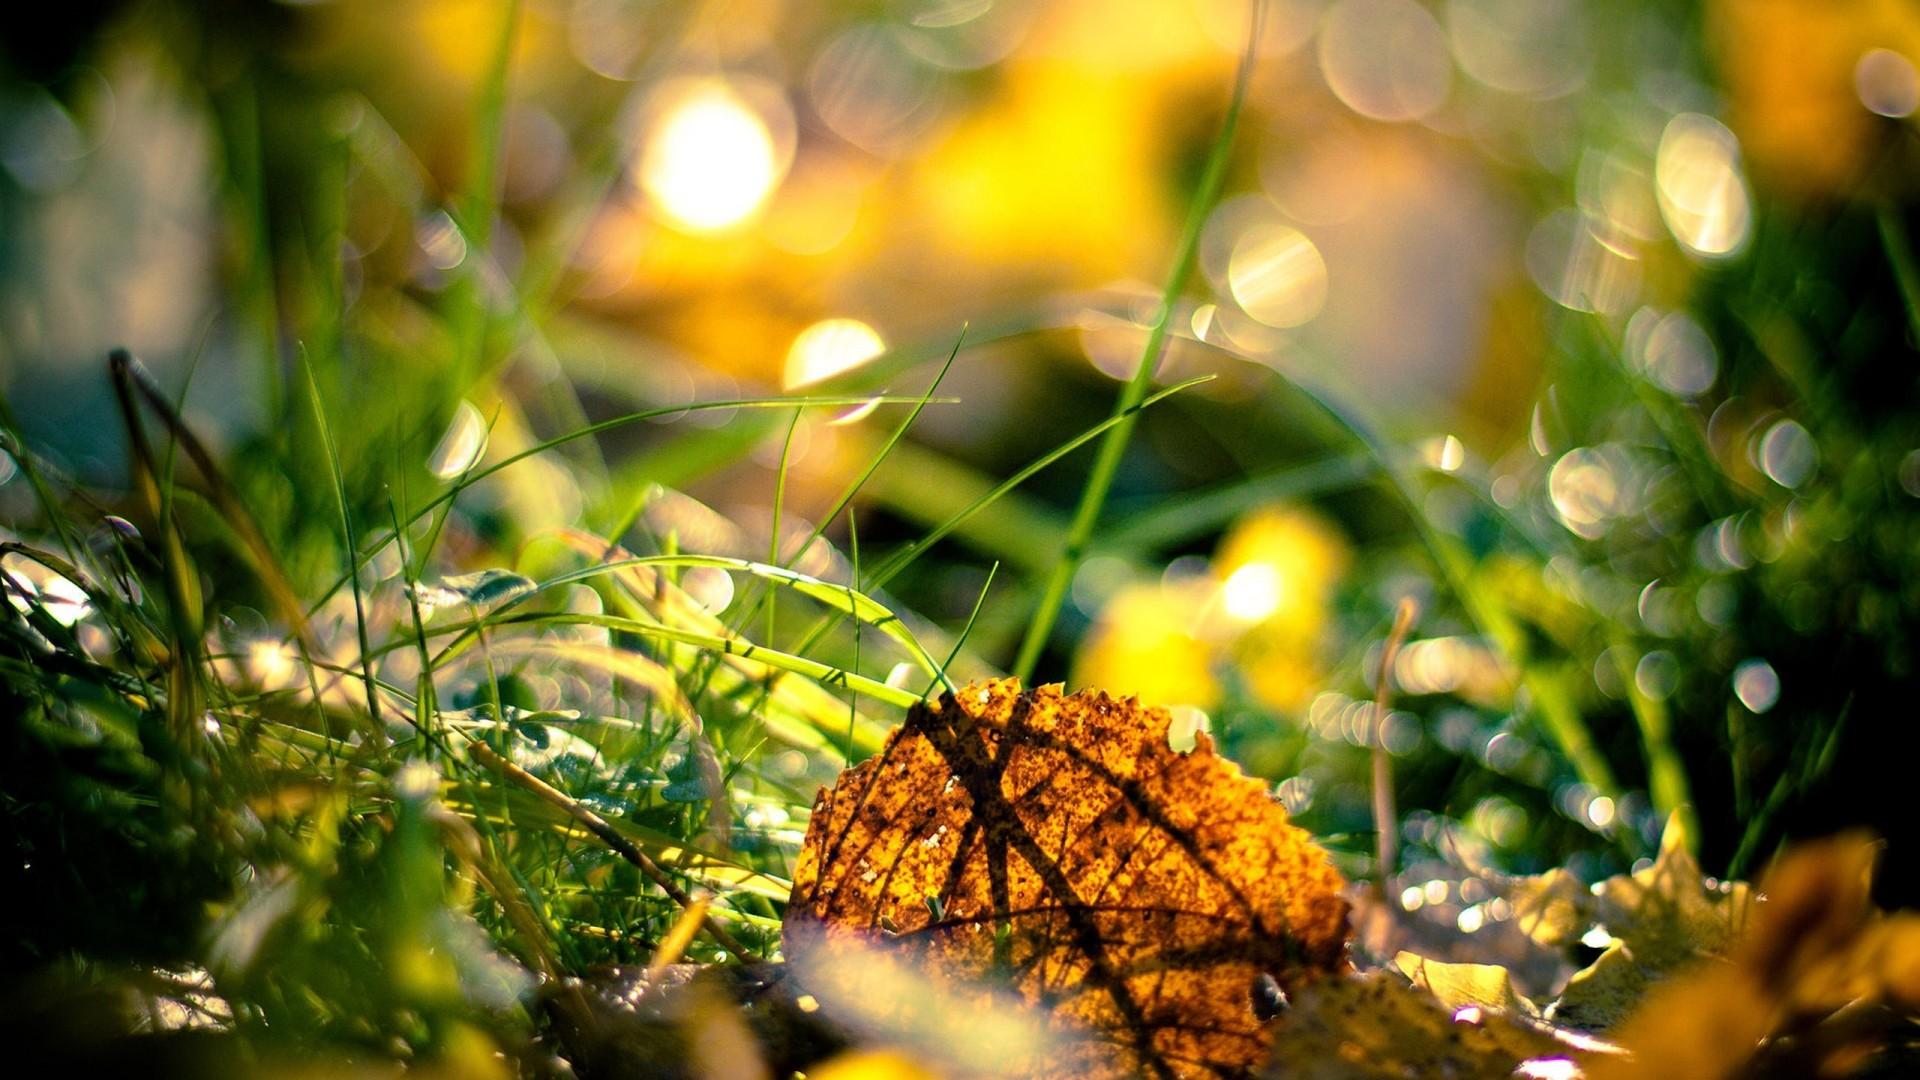 Autumn fresh season 1080p hd pictures nature.